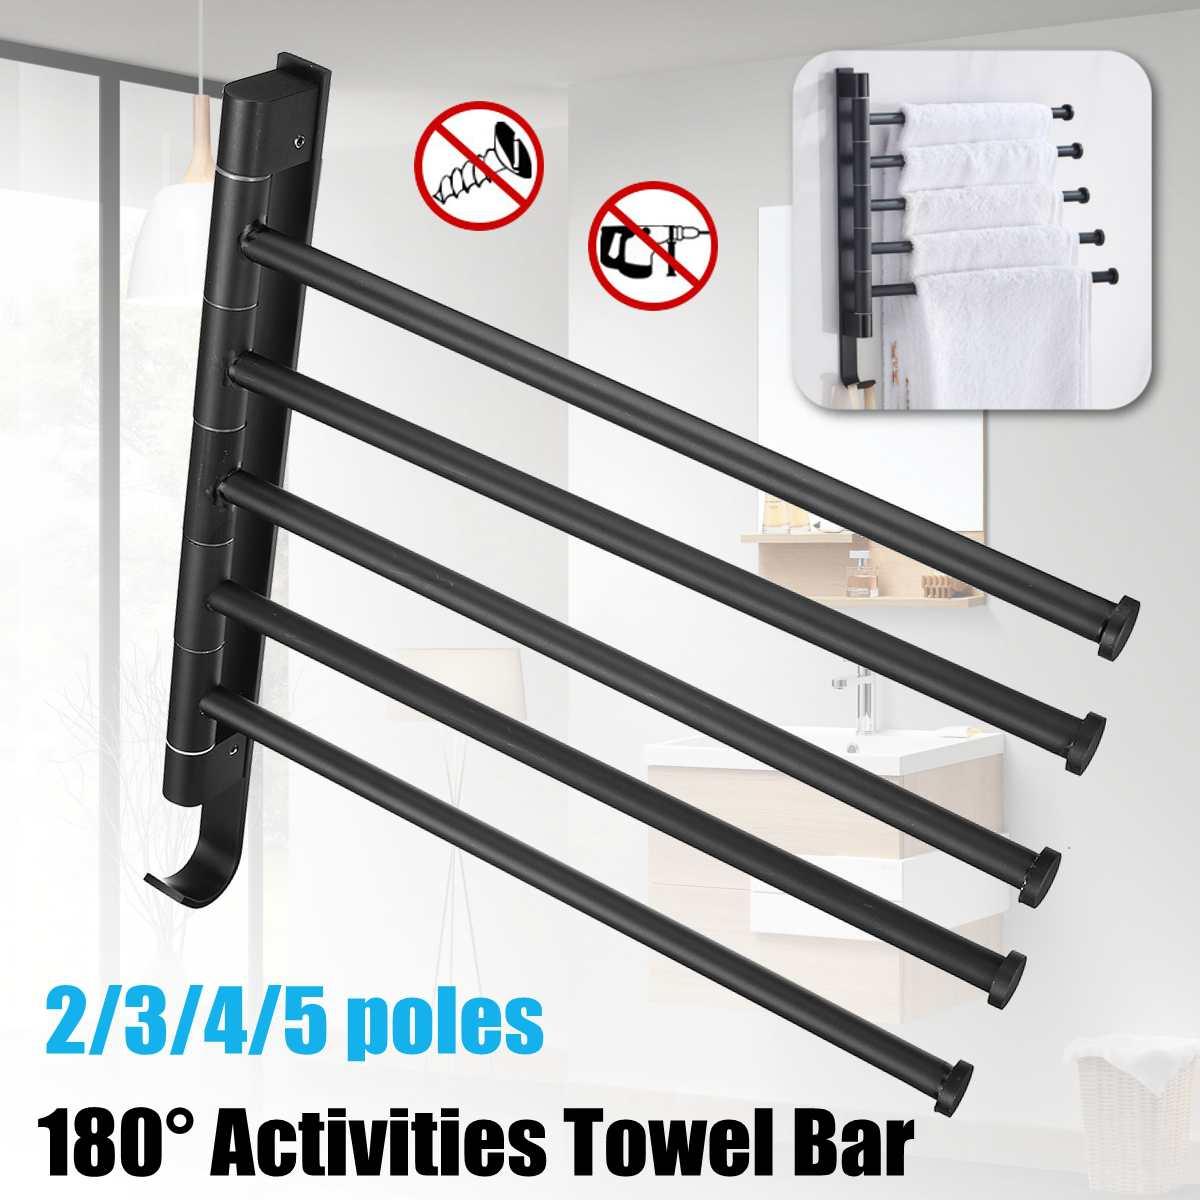 2/3/4/5  Black Stainless Steel Punch Free Towel Bar Rotating Towel Rack Bathroom Kitchen Wall-mounted Towel Polished Rack Holder